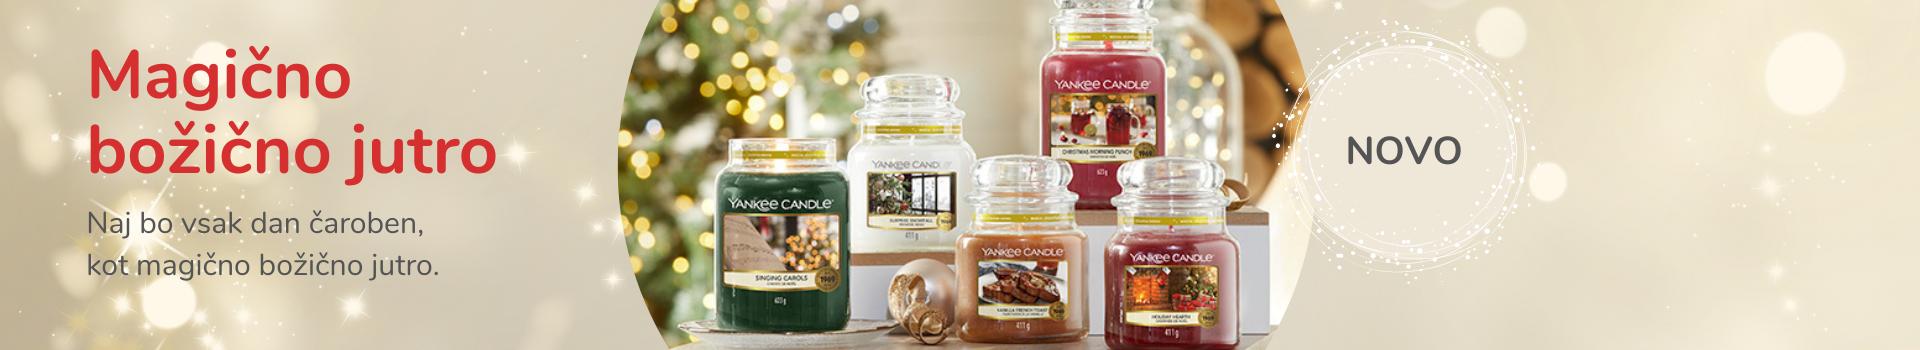 Nova božična kolekcija MAGICAL CHRISTMAS MORNING